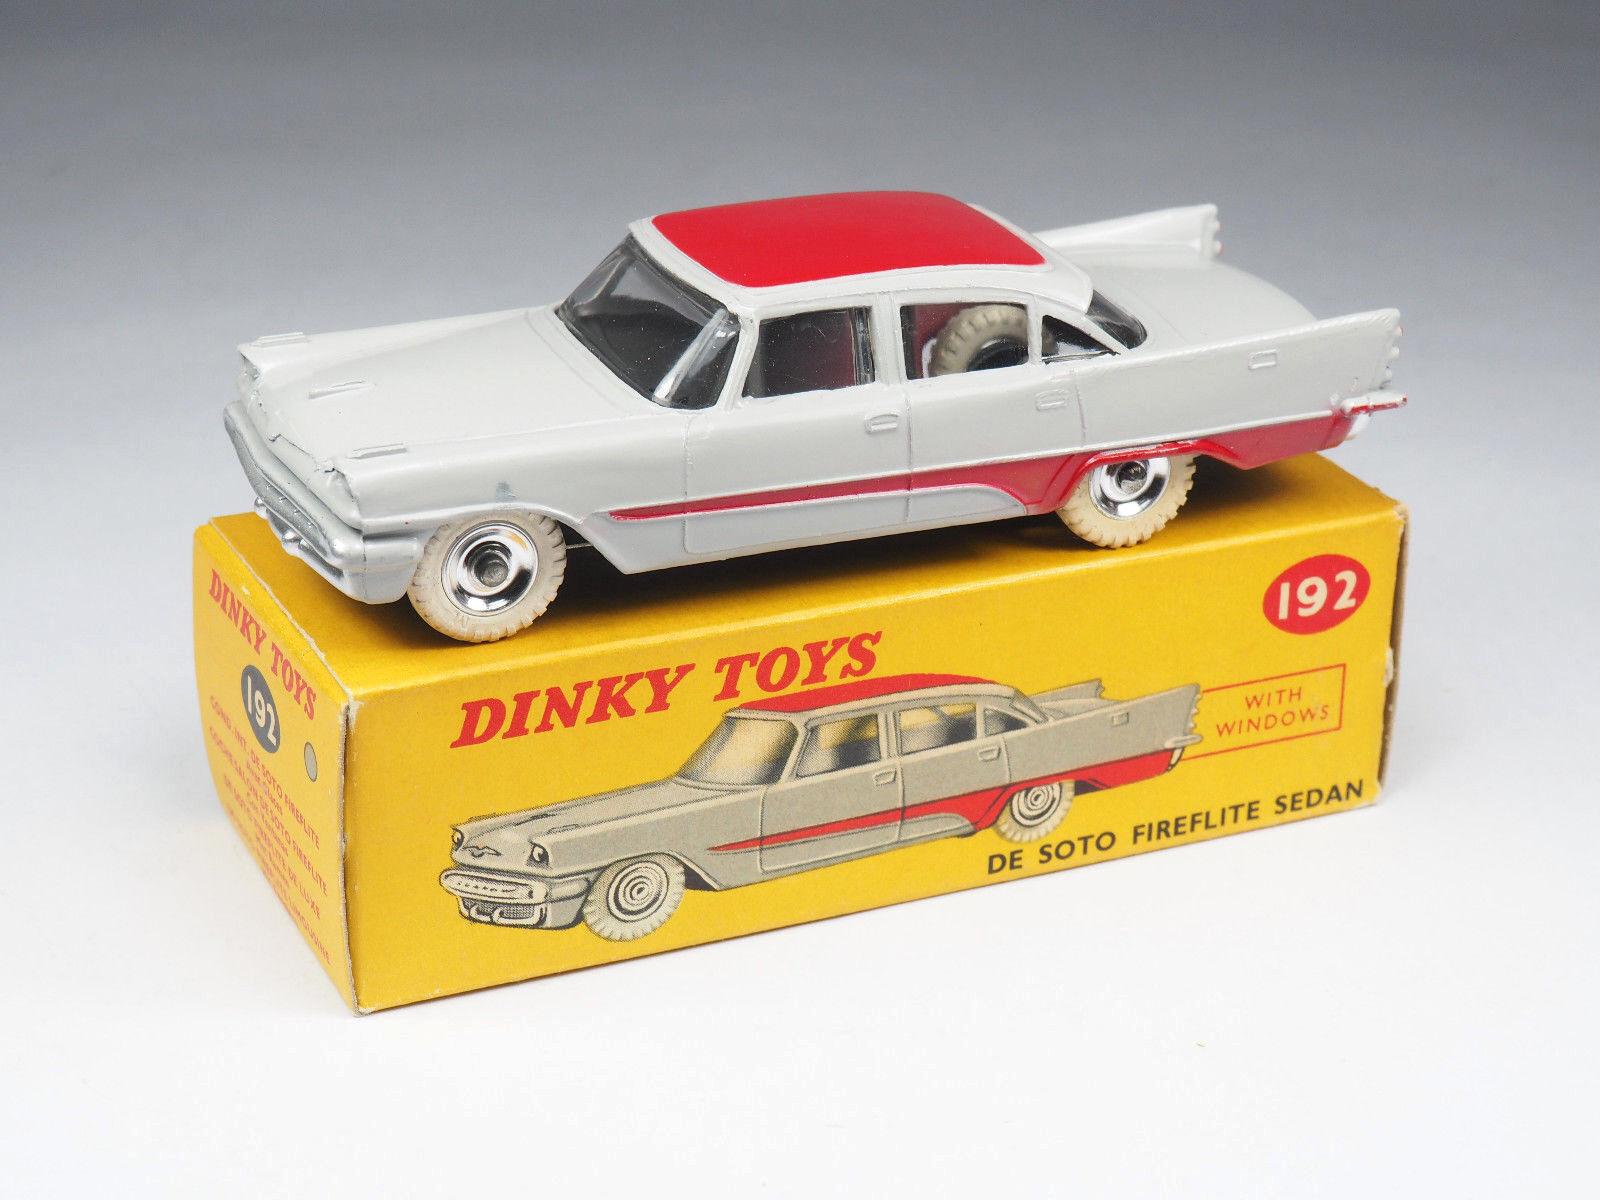 Dinky giocattoli engle -192-de soto fireflite sedan - 1 43e